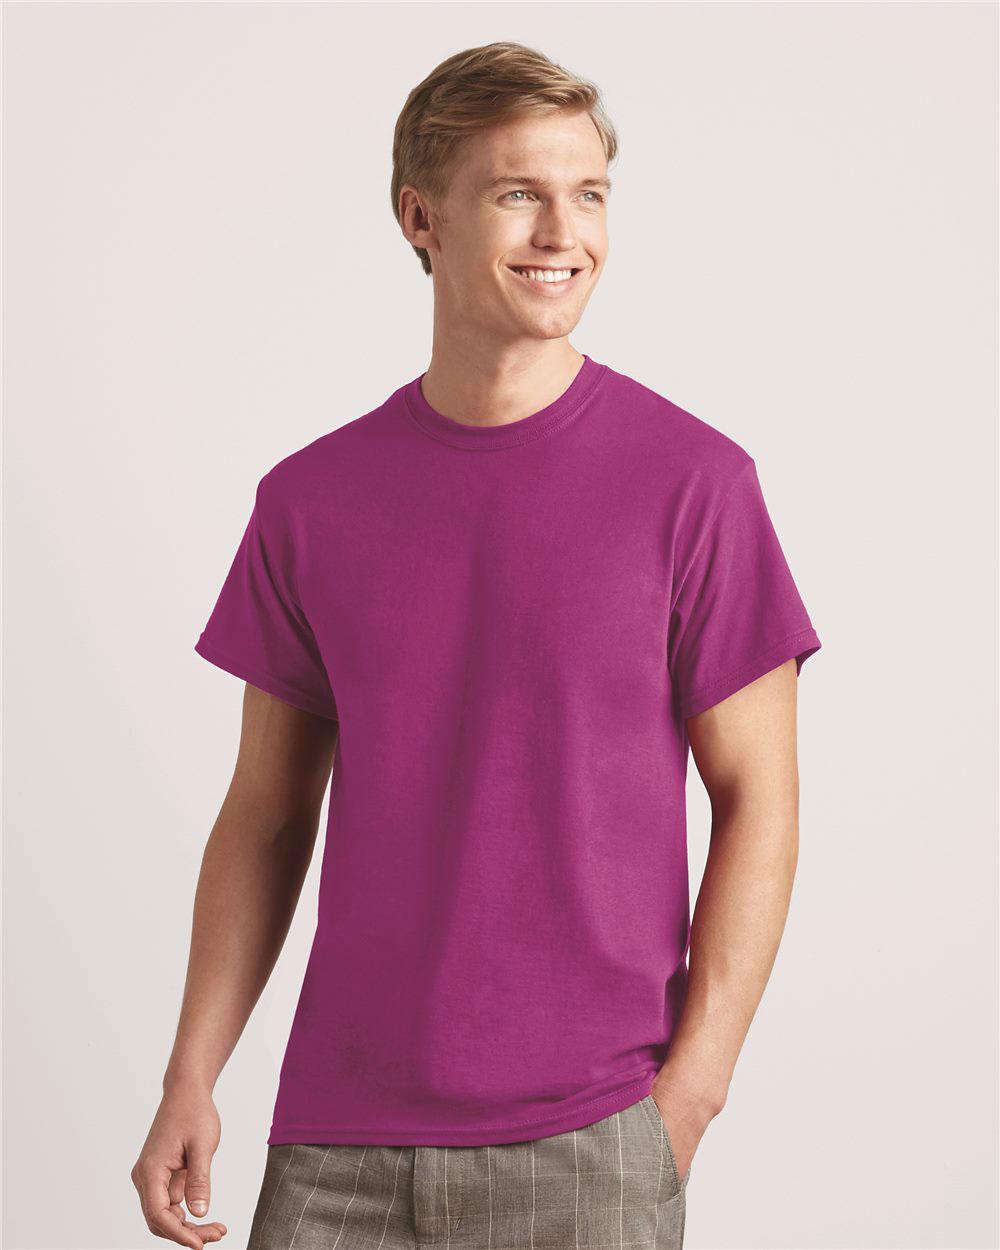 75f4de24 In Case of Emergency Press ::: T-Shirt – Gildan 5000 – Heavy Cotton T-Shirt